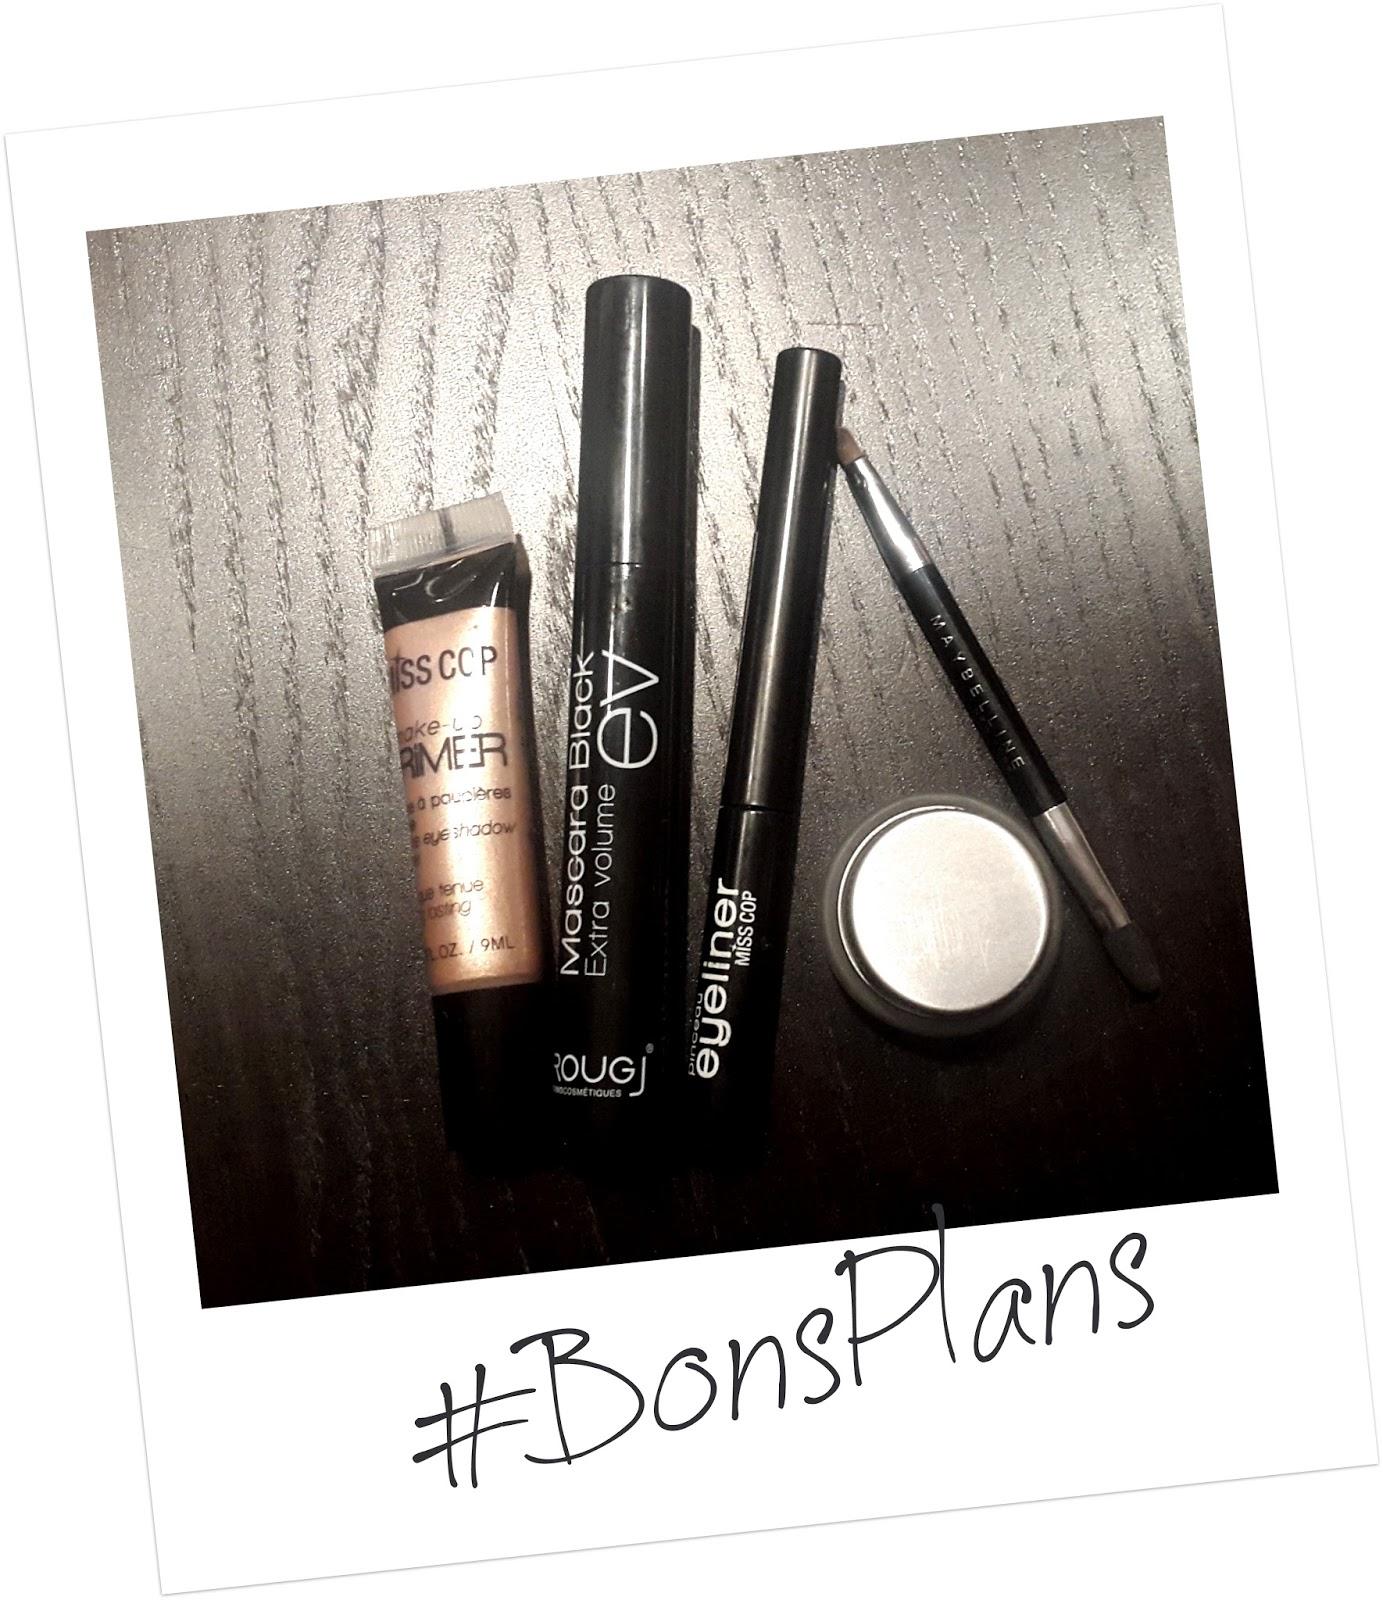 nedjmaonline news deux videos haul favoris et tutoriel makeup day to day avec liner. Black Bedroom Furniture Sets. Home Design Ideas